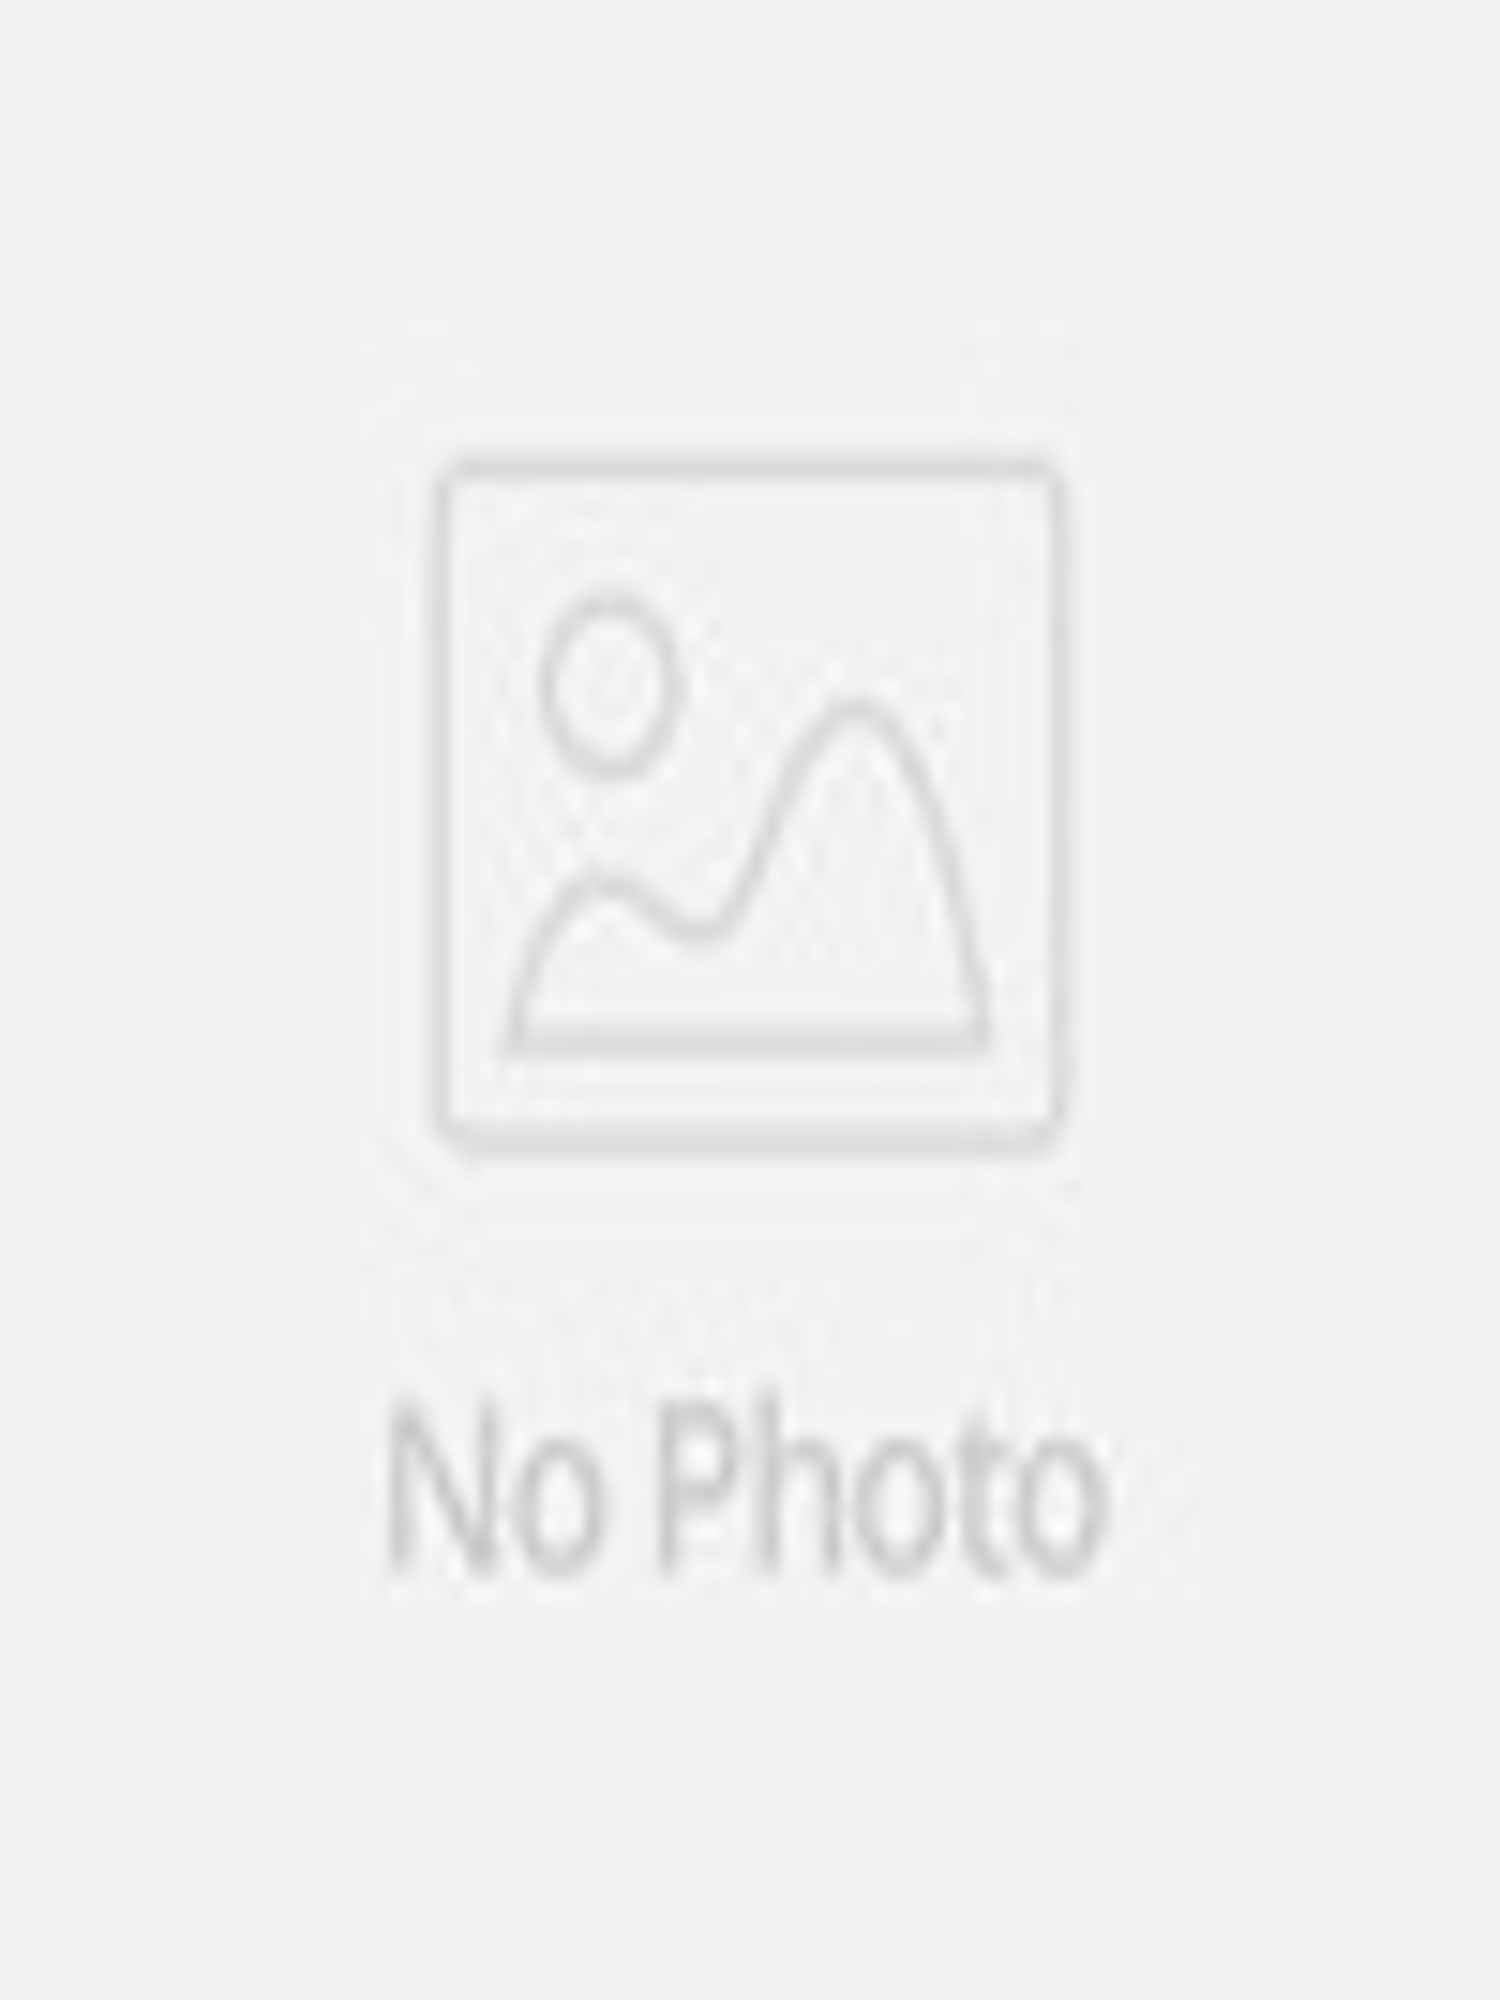 Wedding Dresses Shop Usa - Amore Wedding Dresses